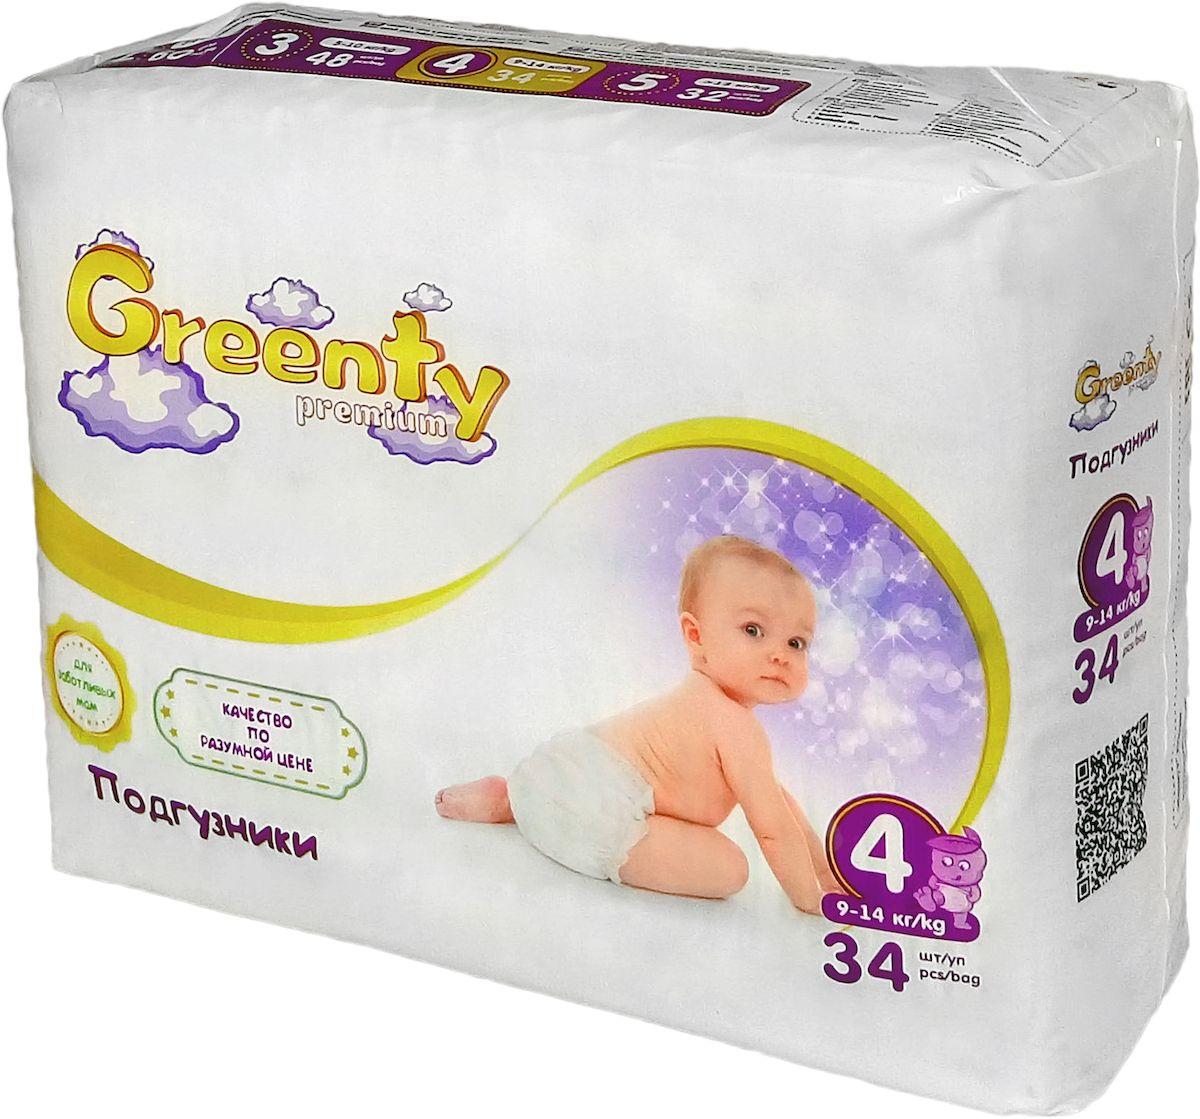 Greenty Подгузники 9-14 кг 34 штGRE-PR-4mGREENTY Одноразовые детские подгузники 9-14 кг (размер 4) 34 шт